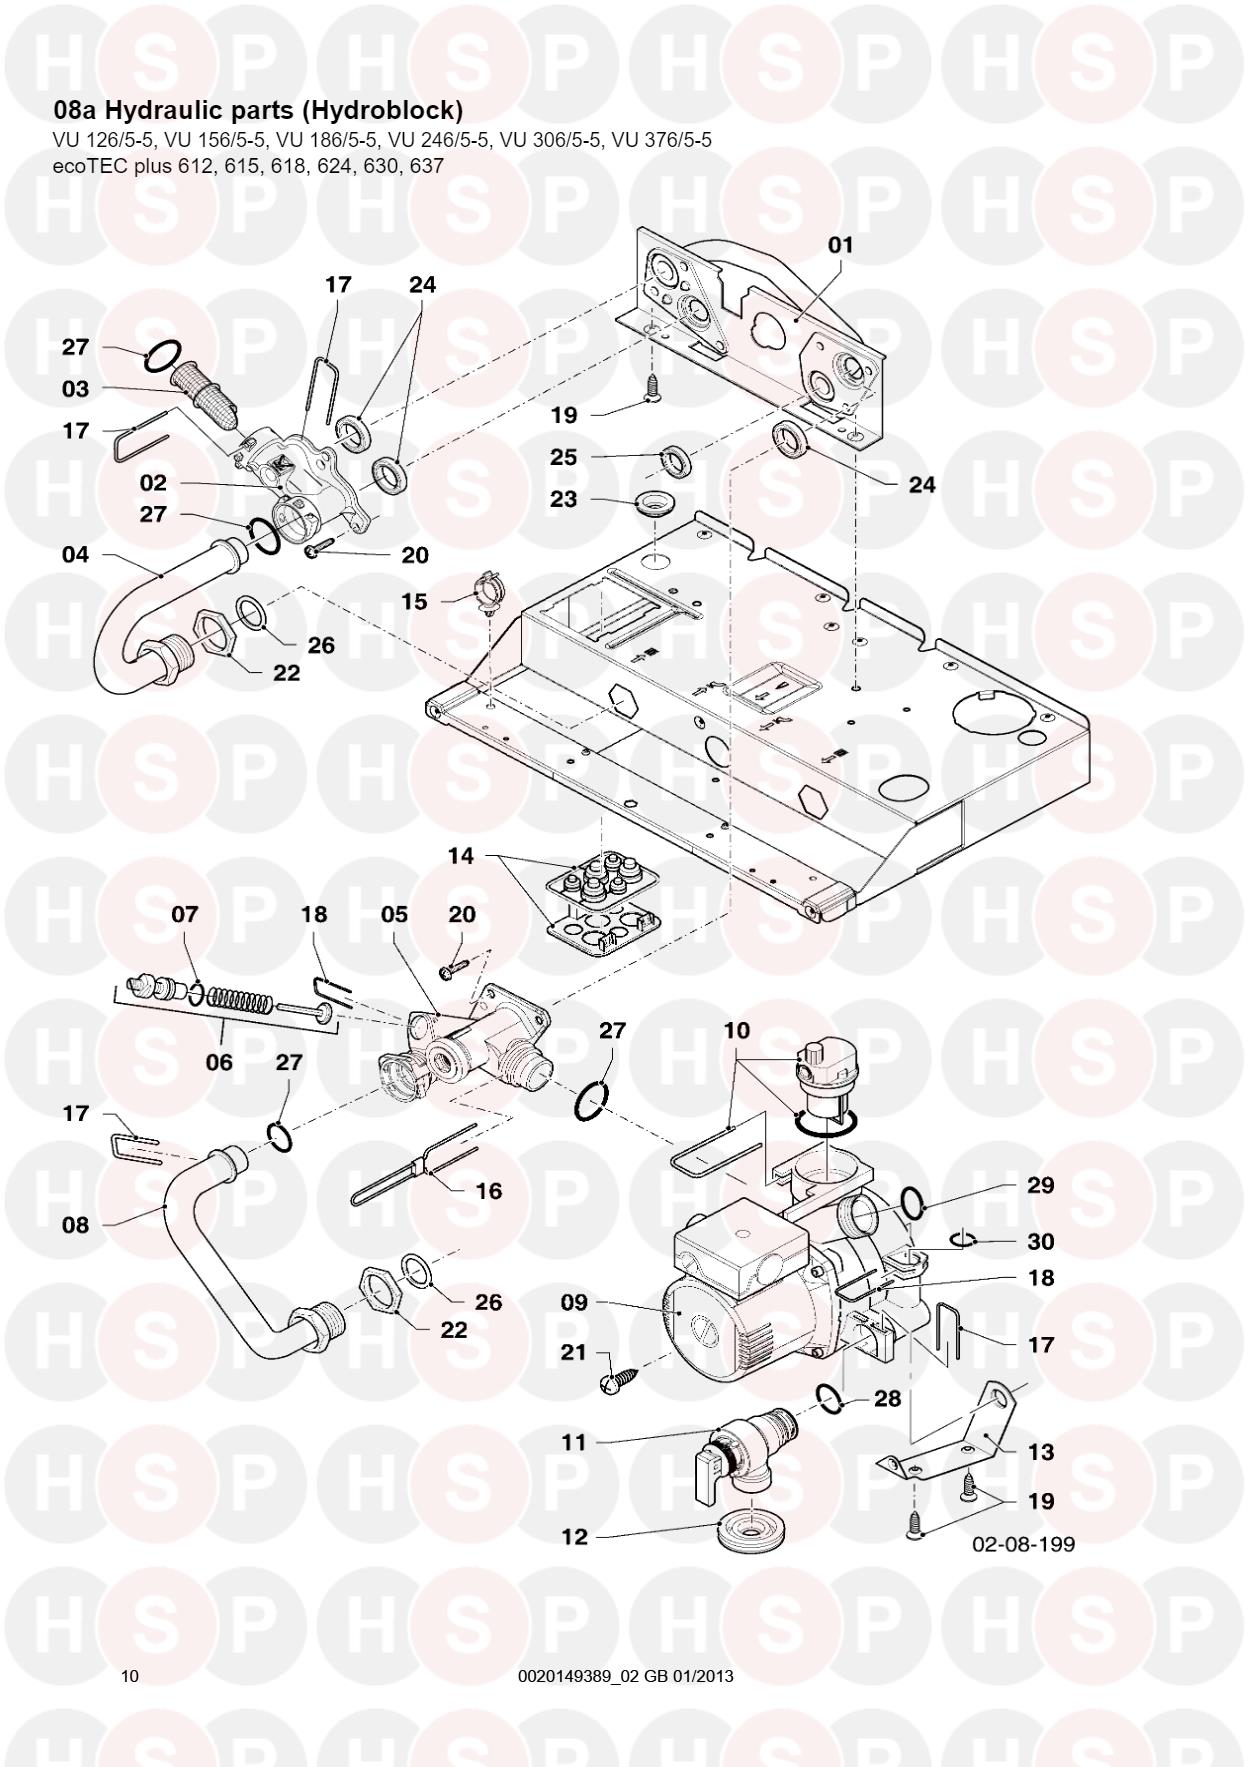 Vaillant ecotec plus 618 wiring diagram the best wiring diagram 2017 vaillant ecotec plus 612 615 618 624 630 637 08a hydraulic asfbconference2016 Choice Image